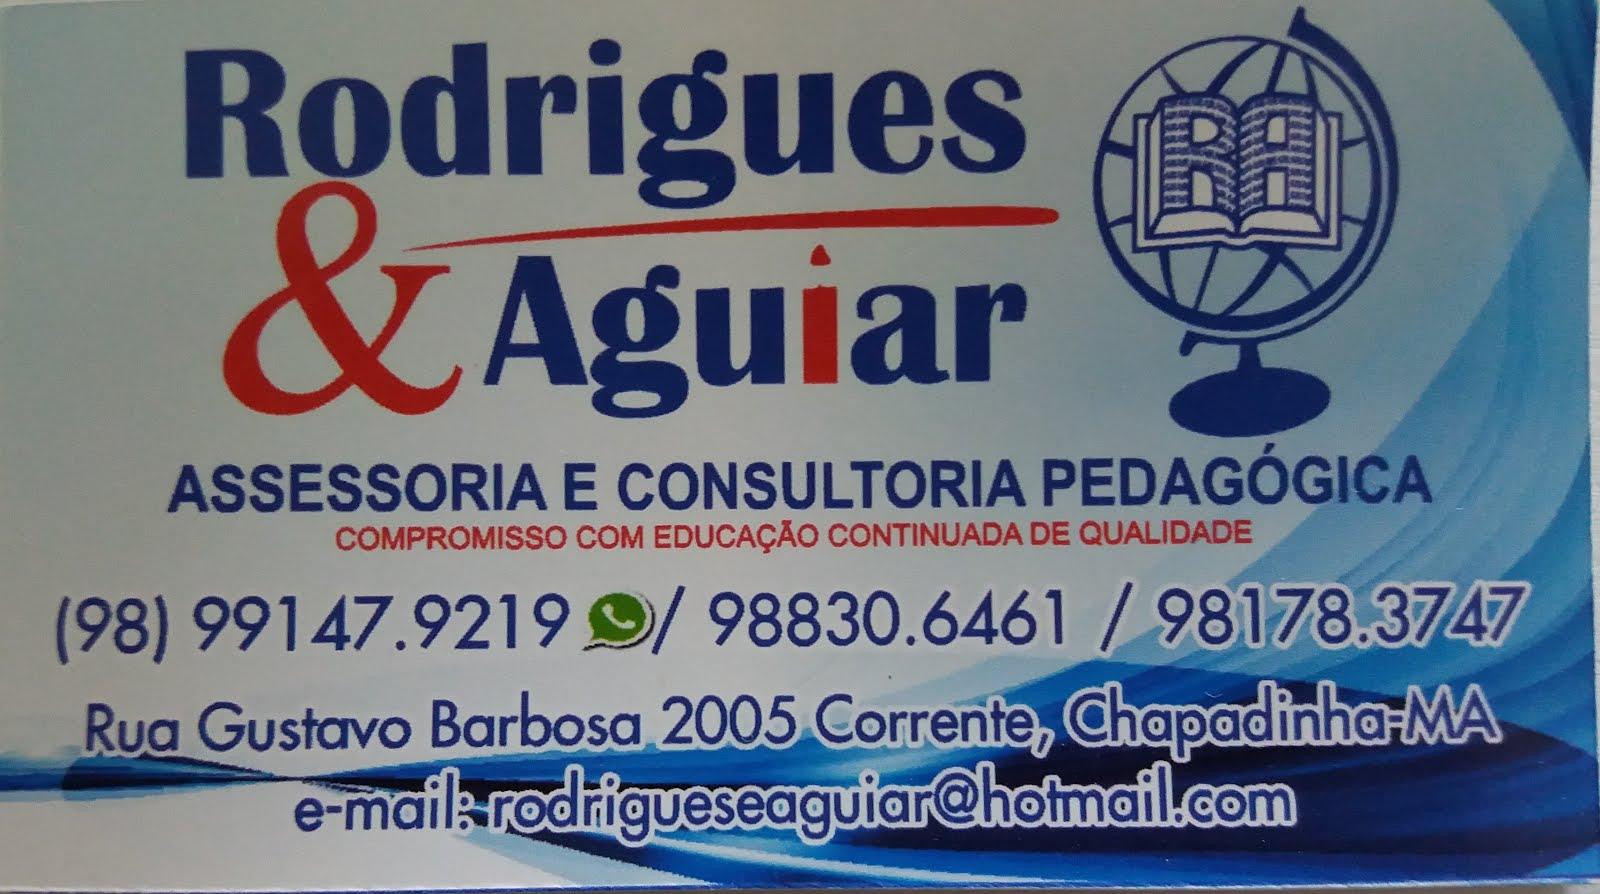 ASSESSORIA E CONSULTORIA PEDAGOGICA